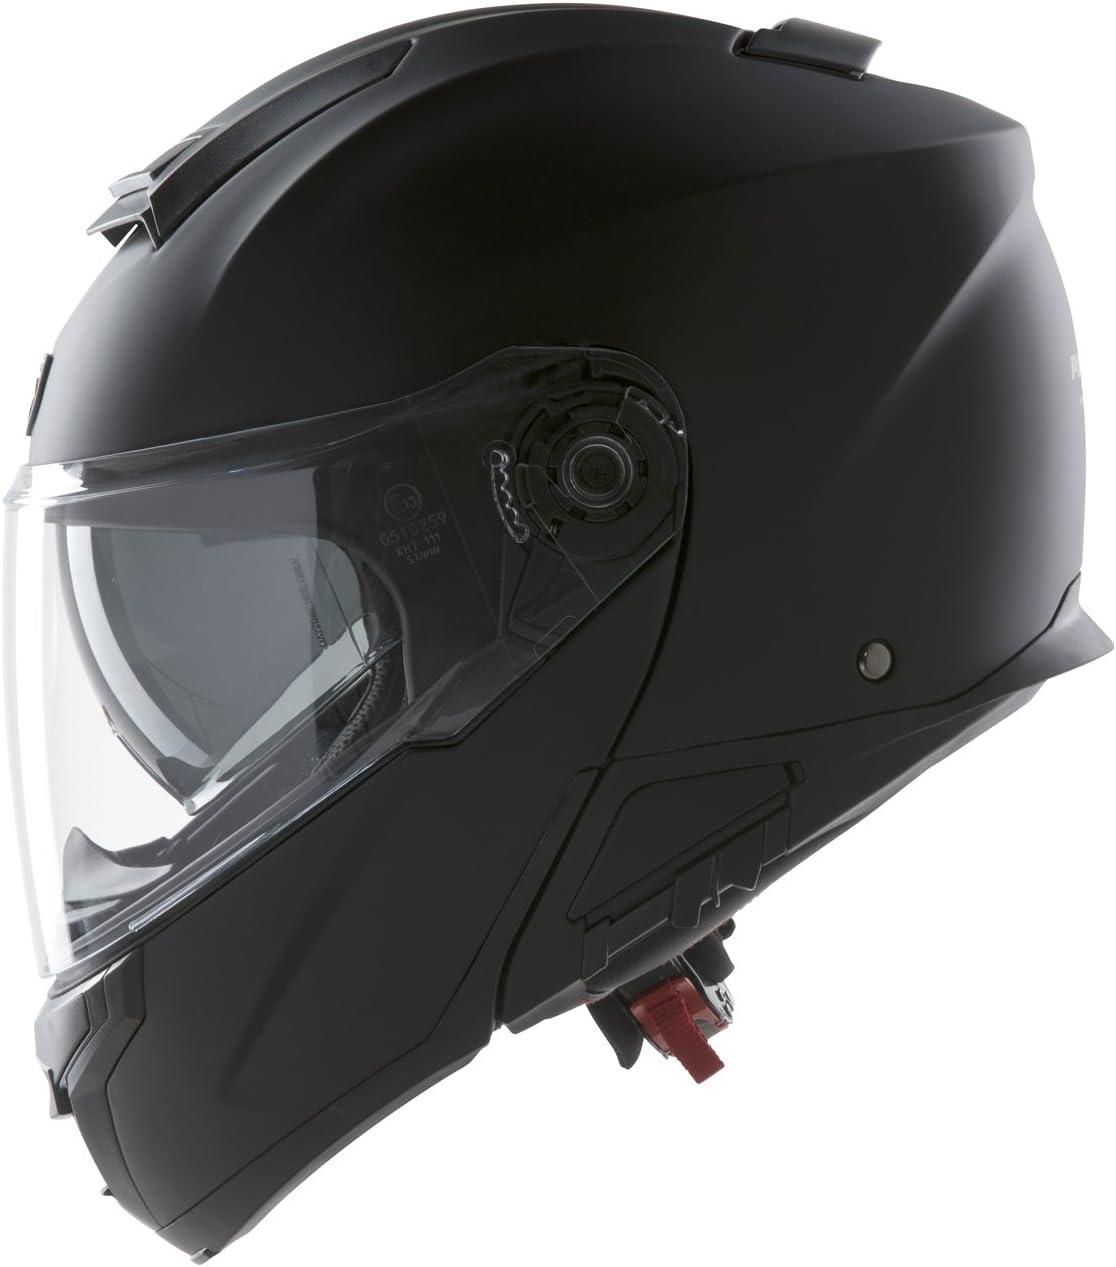 Panthera casco modular Hybrid nero opaco taille M